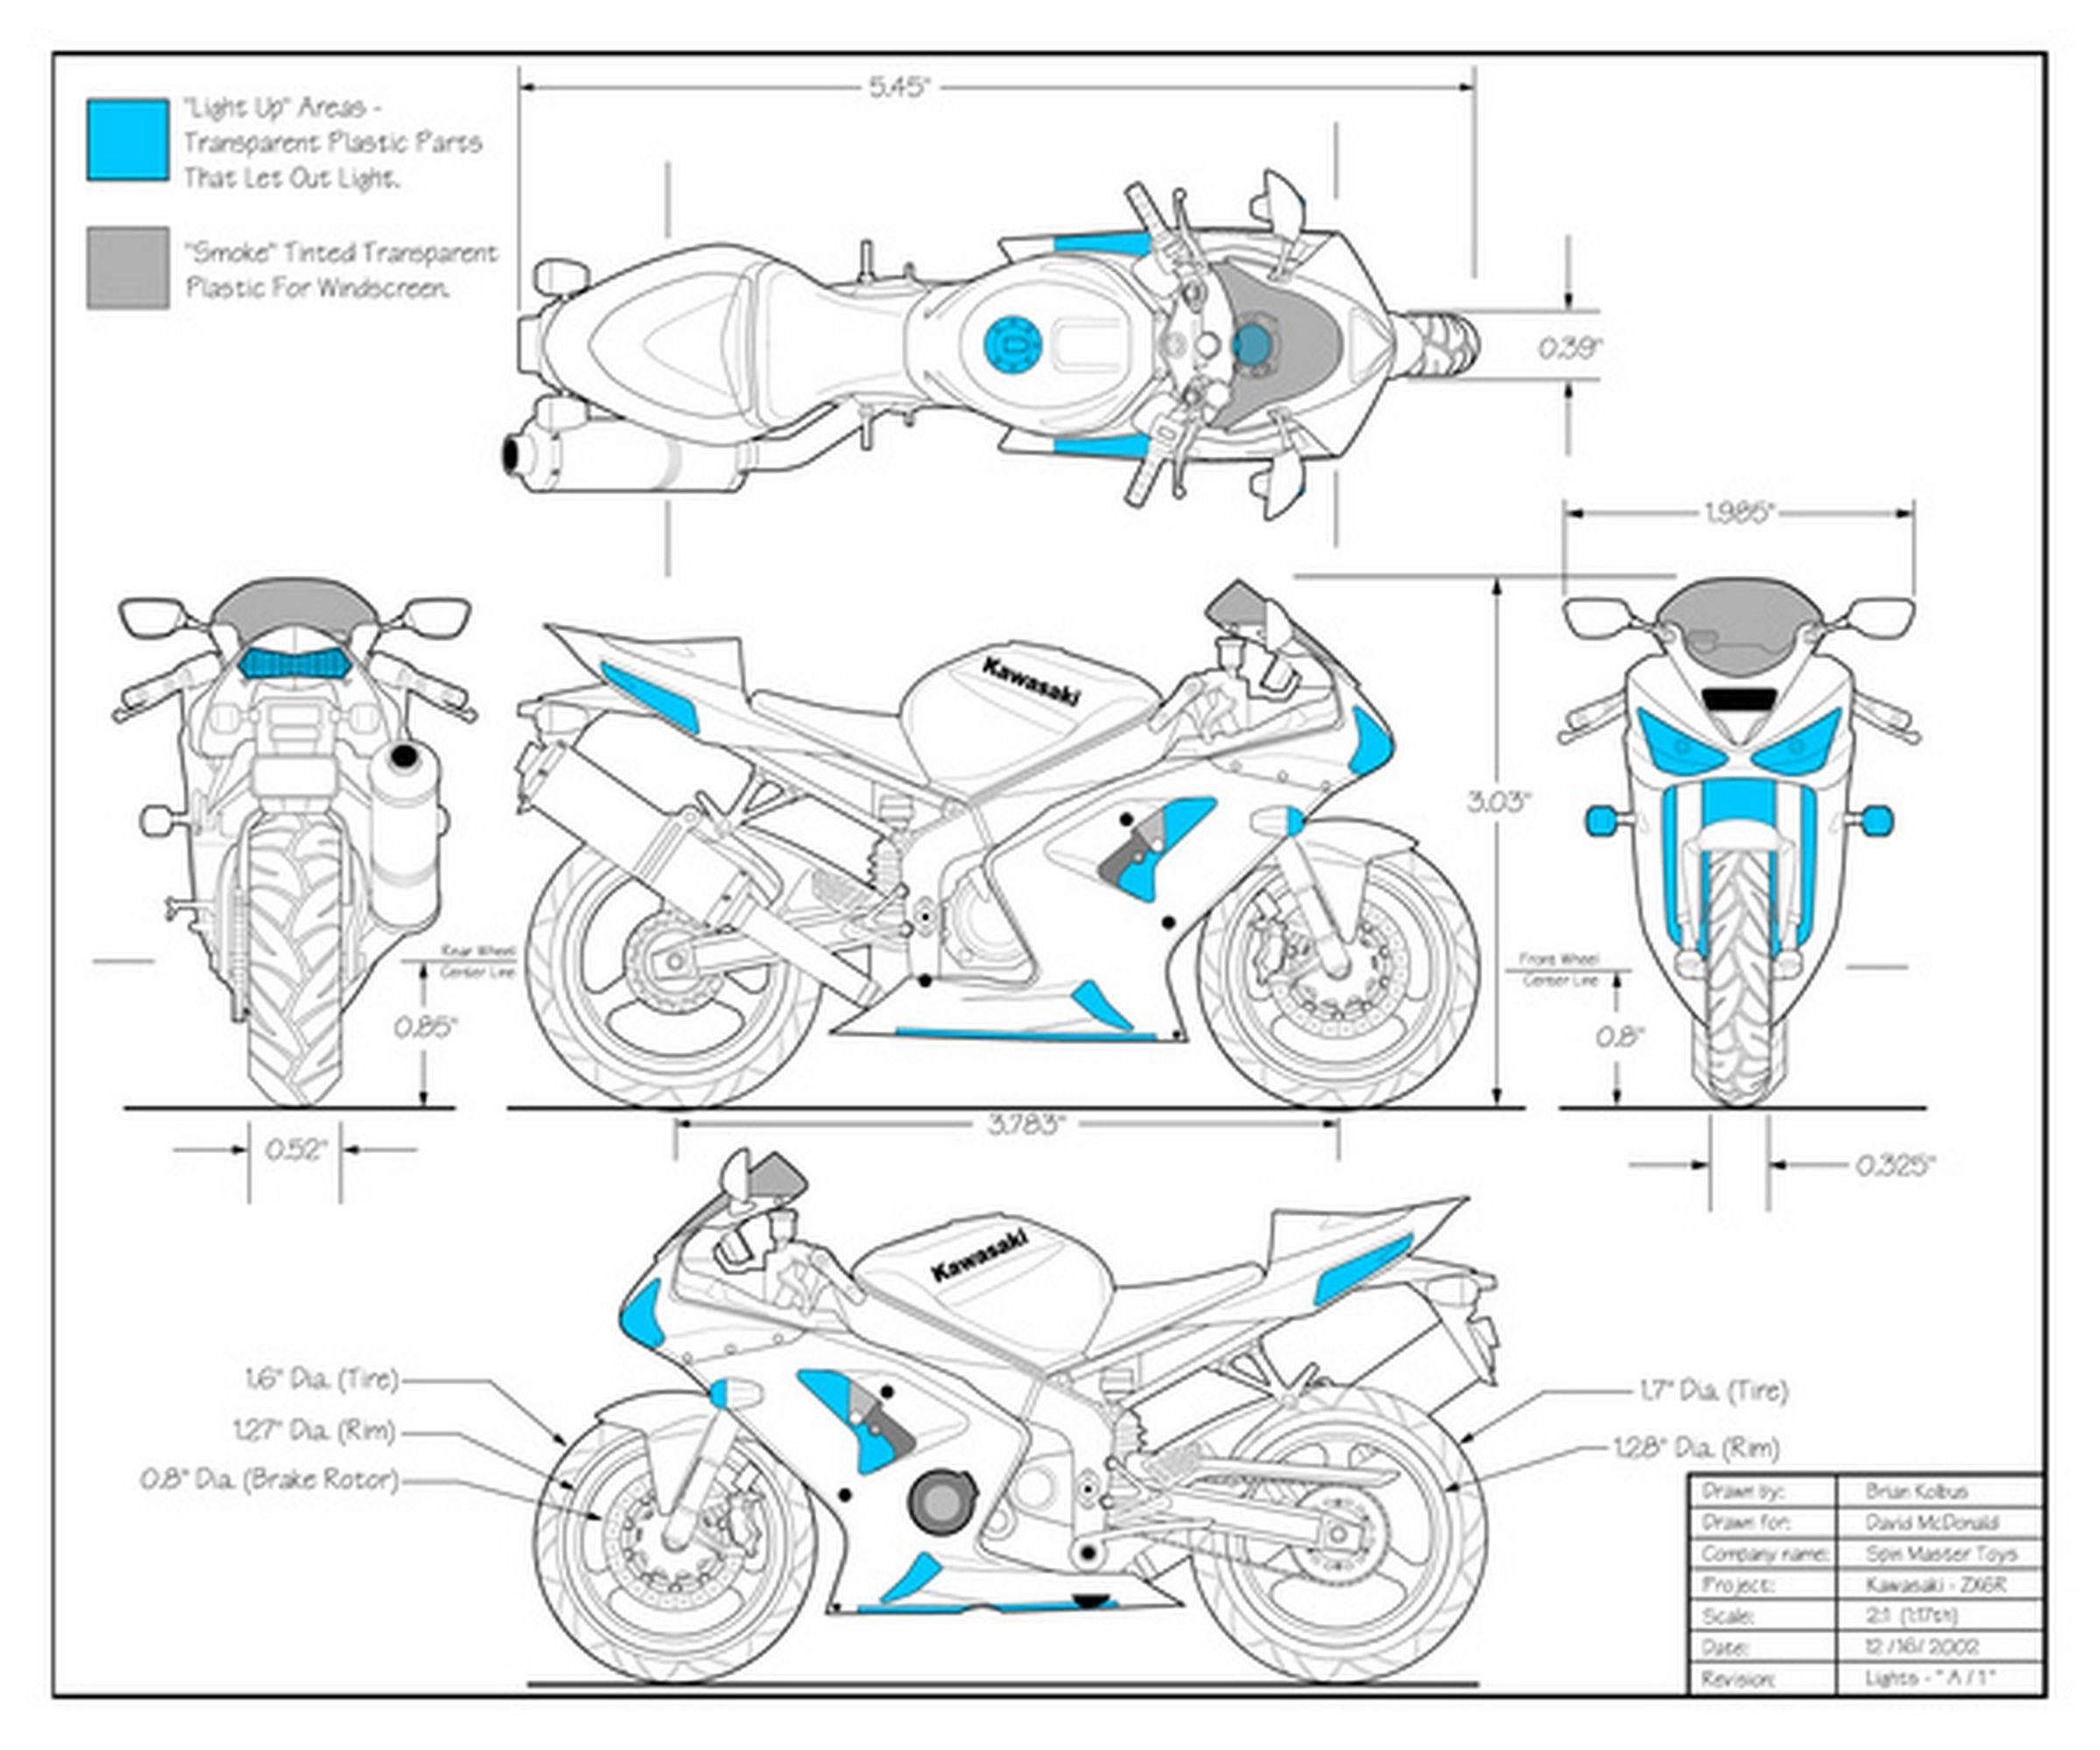 Kawasaki Zx6r 636 Blueprints